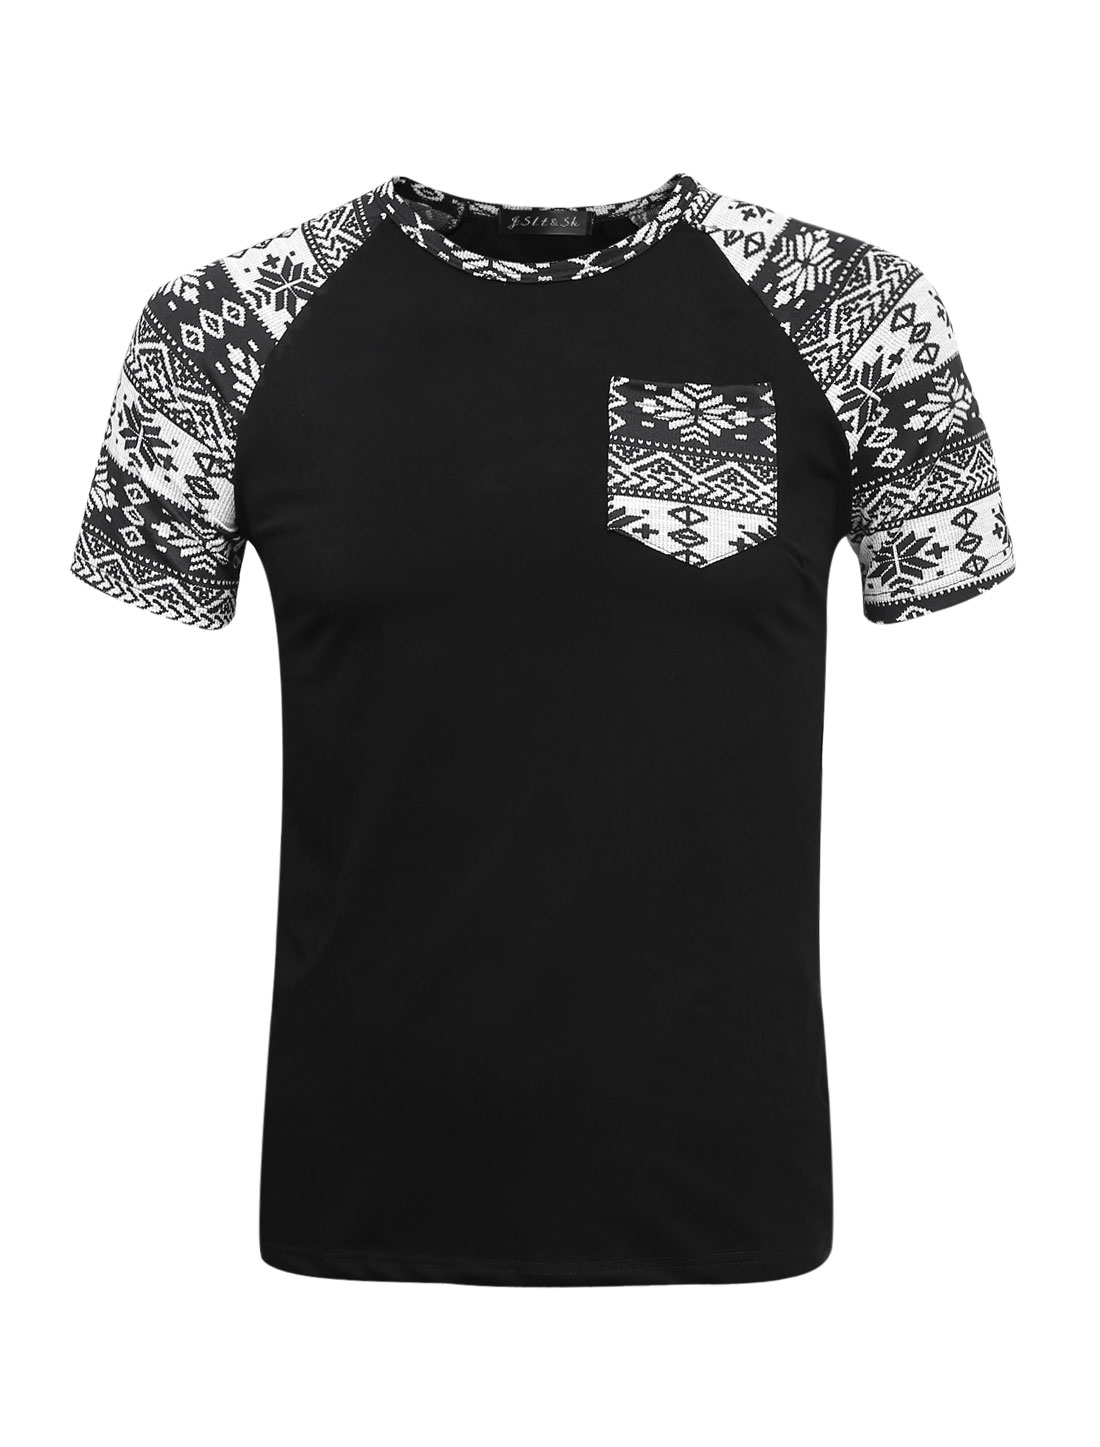 Men Snowflake Prints Short Raglan Sleeve Slim Fit T-Shirt Black S